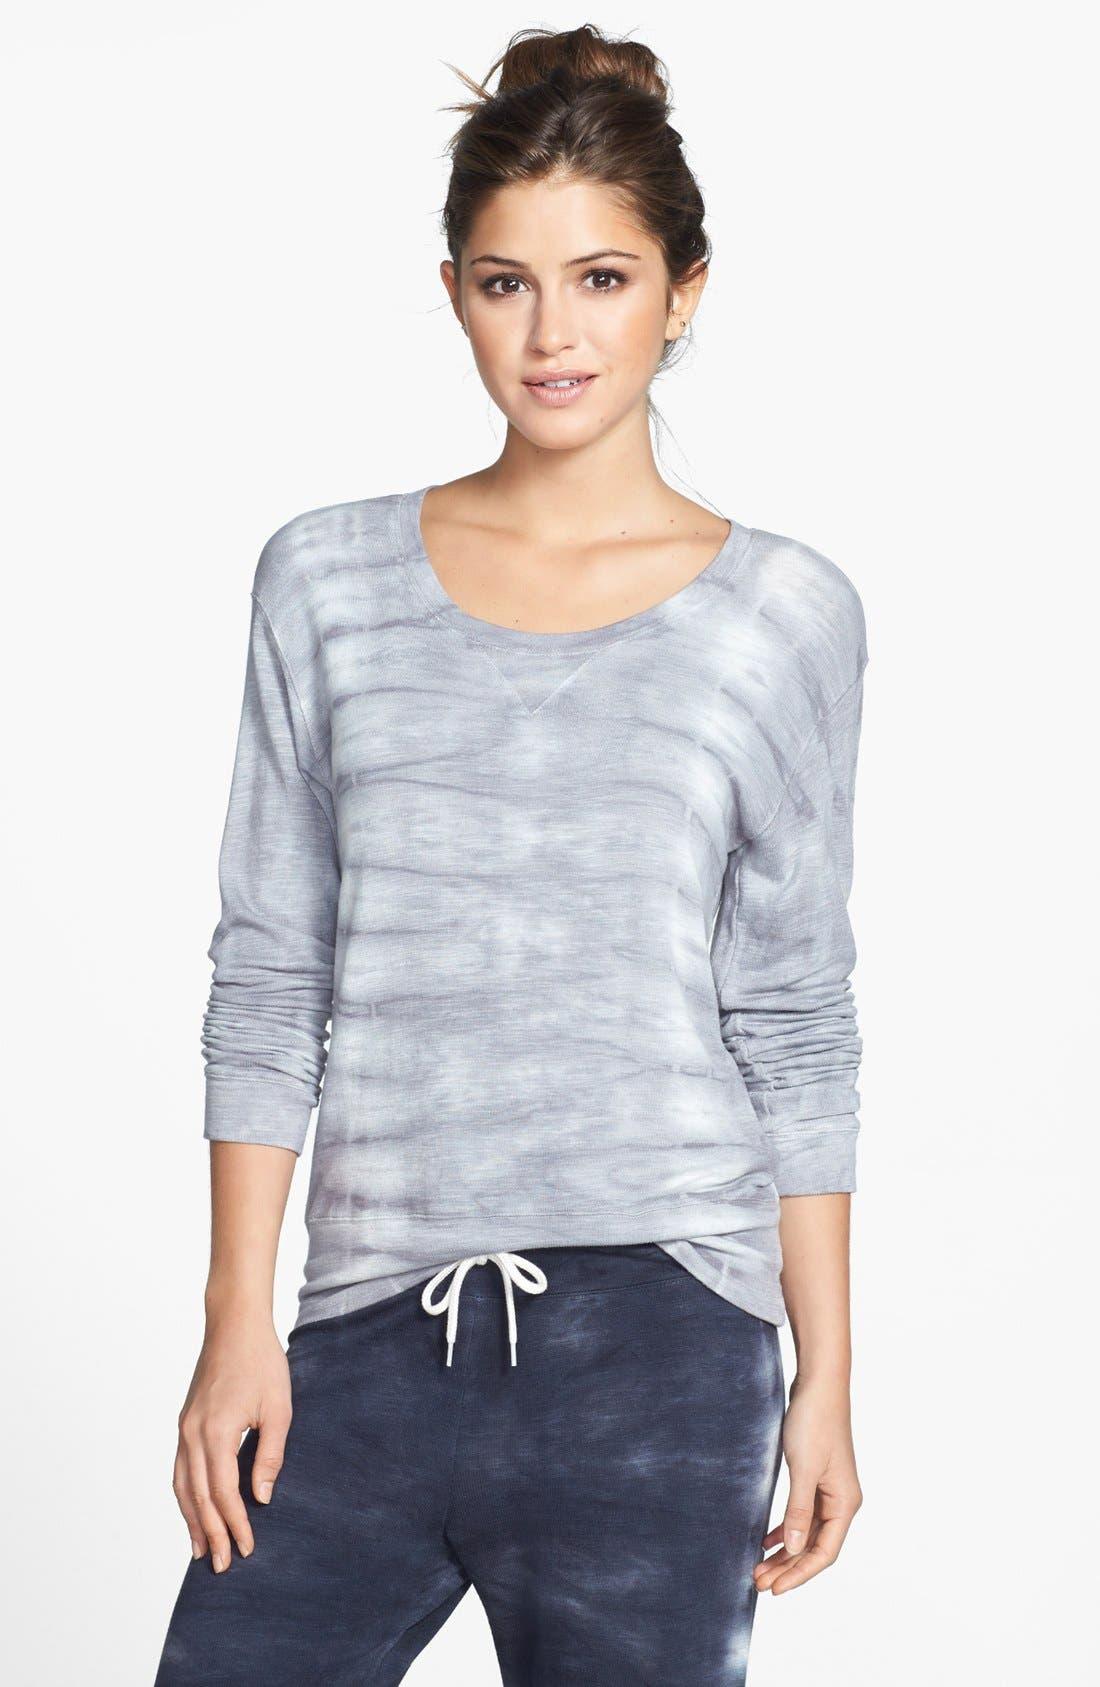 Alternate Image 1 Selected - Monrow 'Fish Bone' Crewneck Sweatshirt